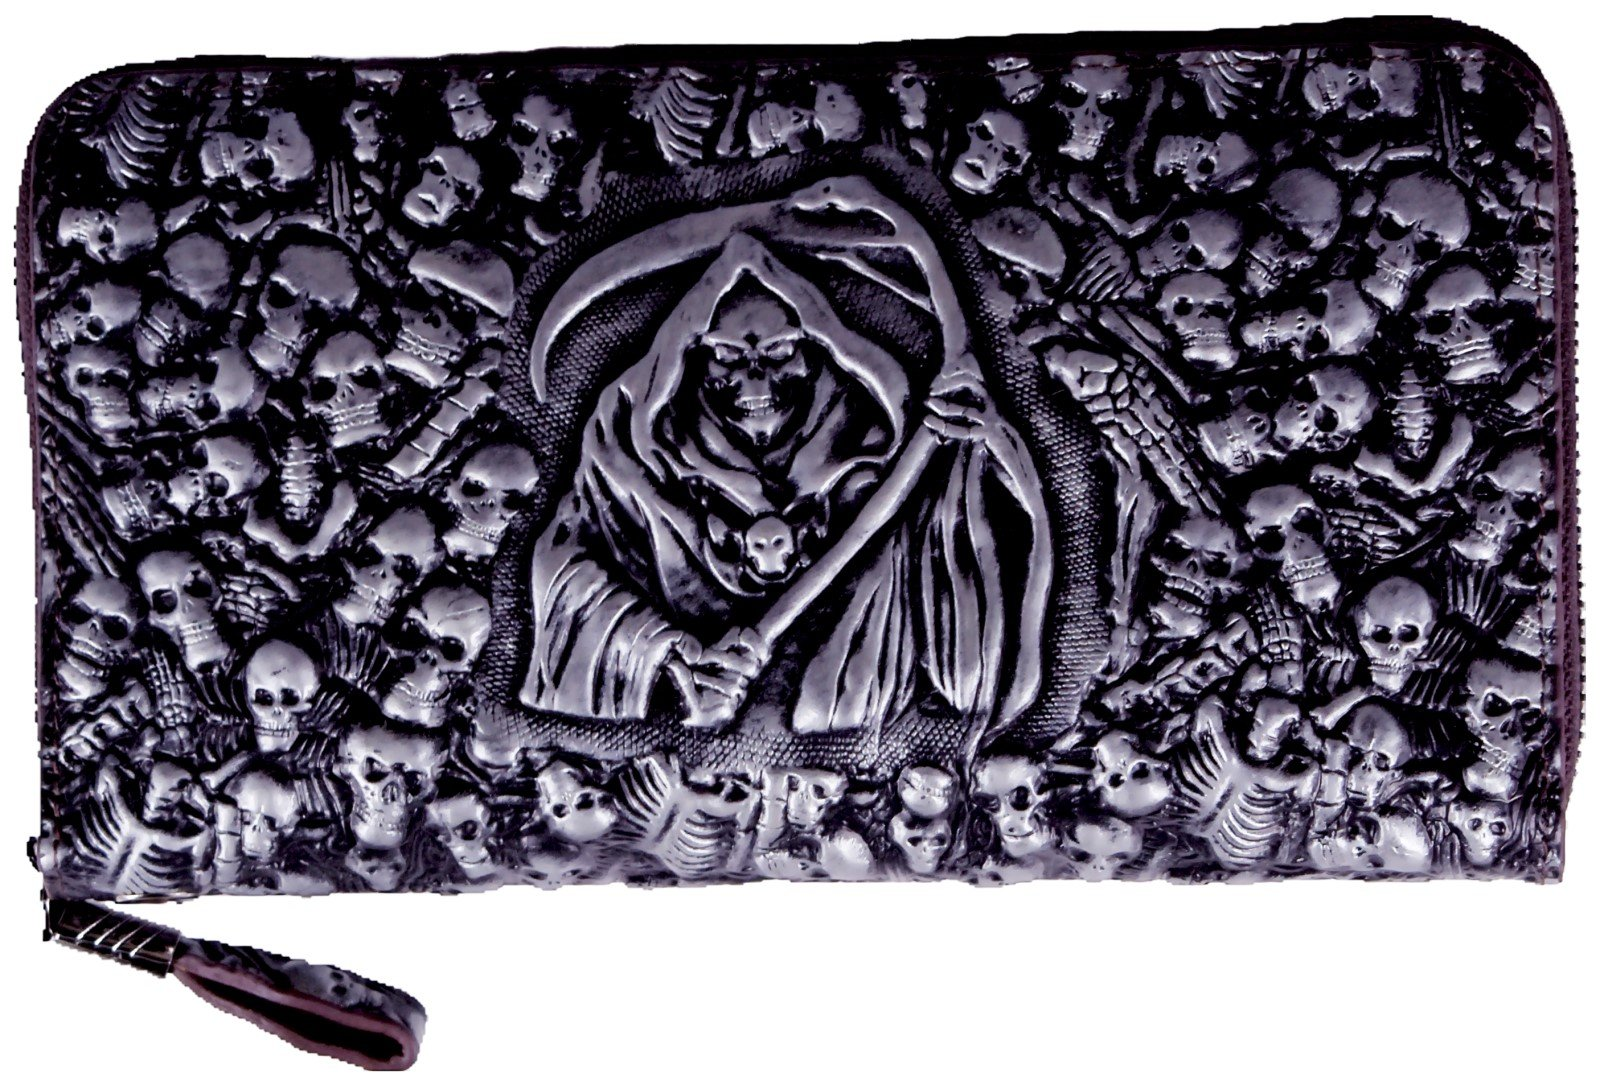 ABC STORY Mens Real Leather Gothic Grim Reaper Black Skull Evening Clutch Handbag Wristlets For Women